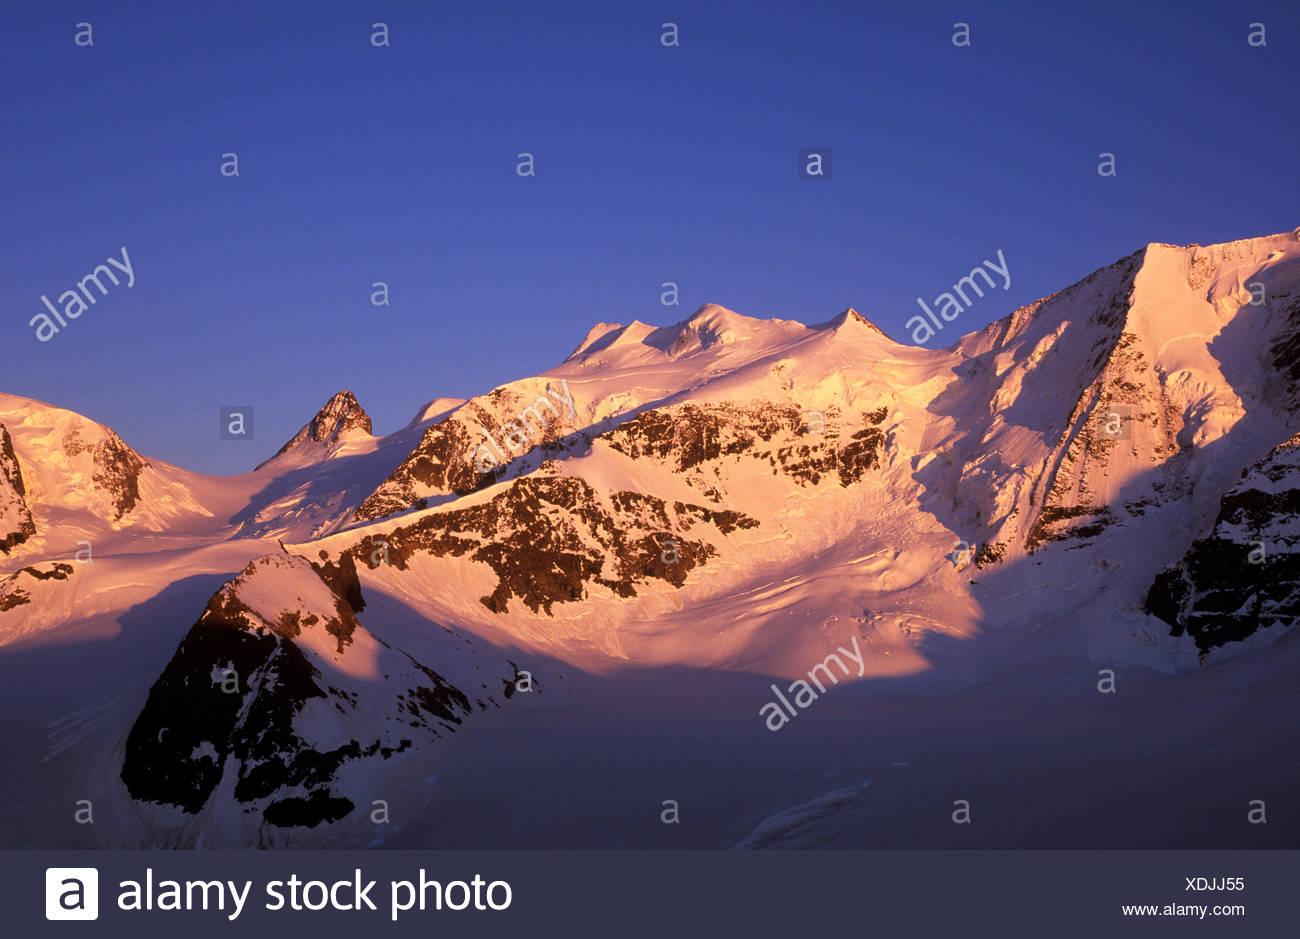 Bellavista Range in the morning, Bernina Range, Graubuenden, Switzerland, Europe - Stock Image